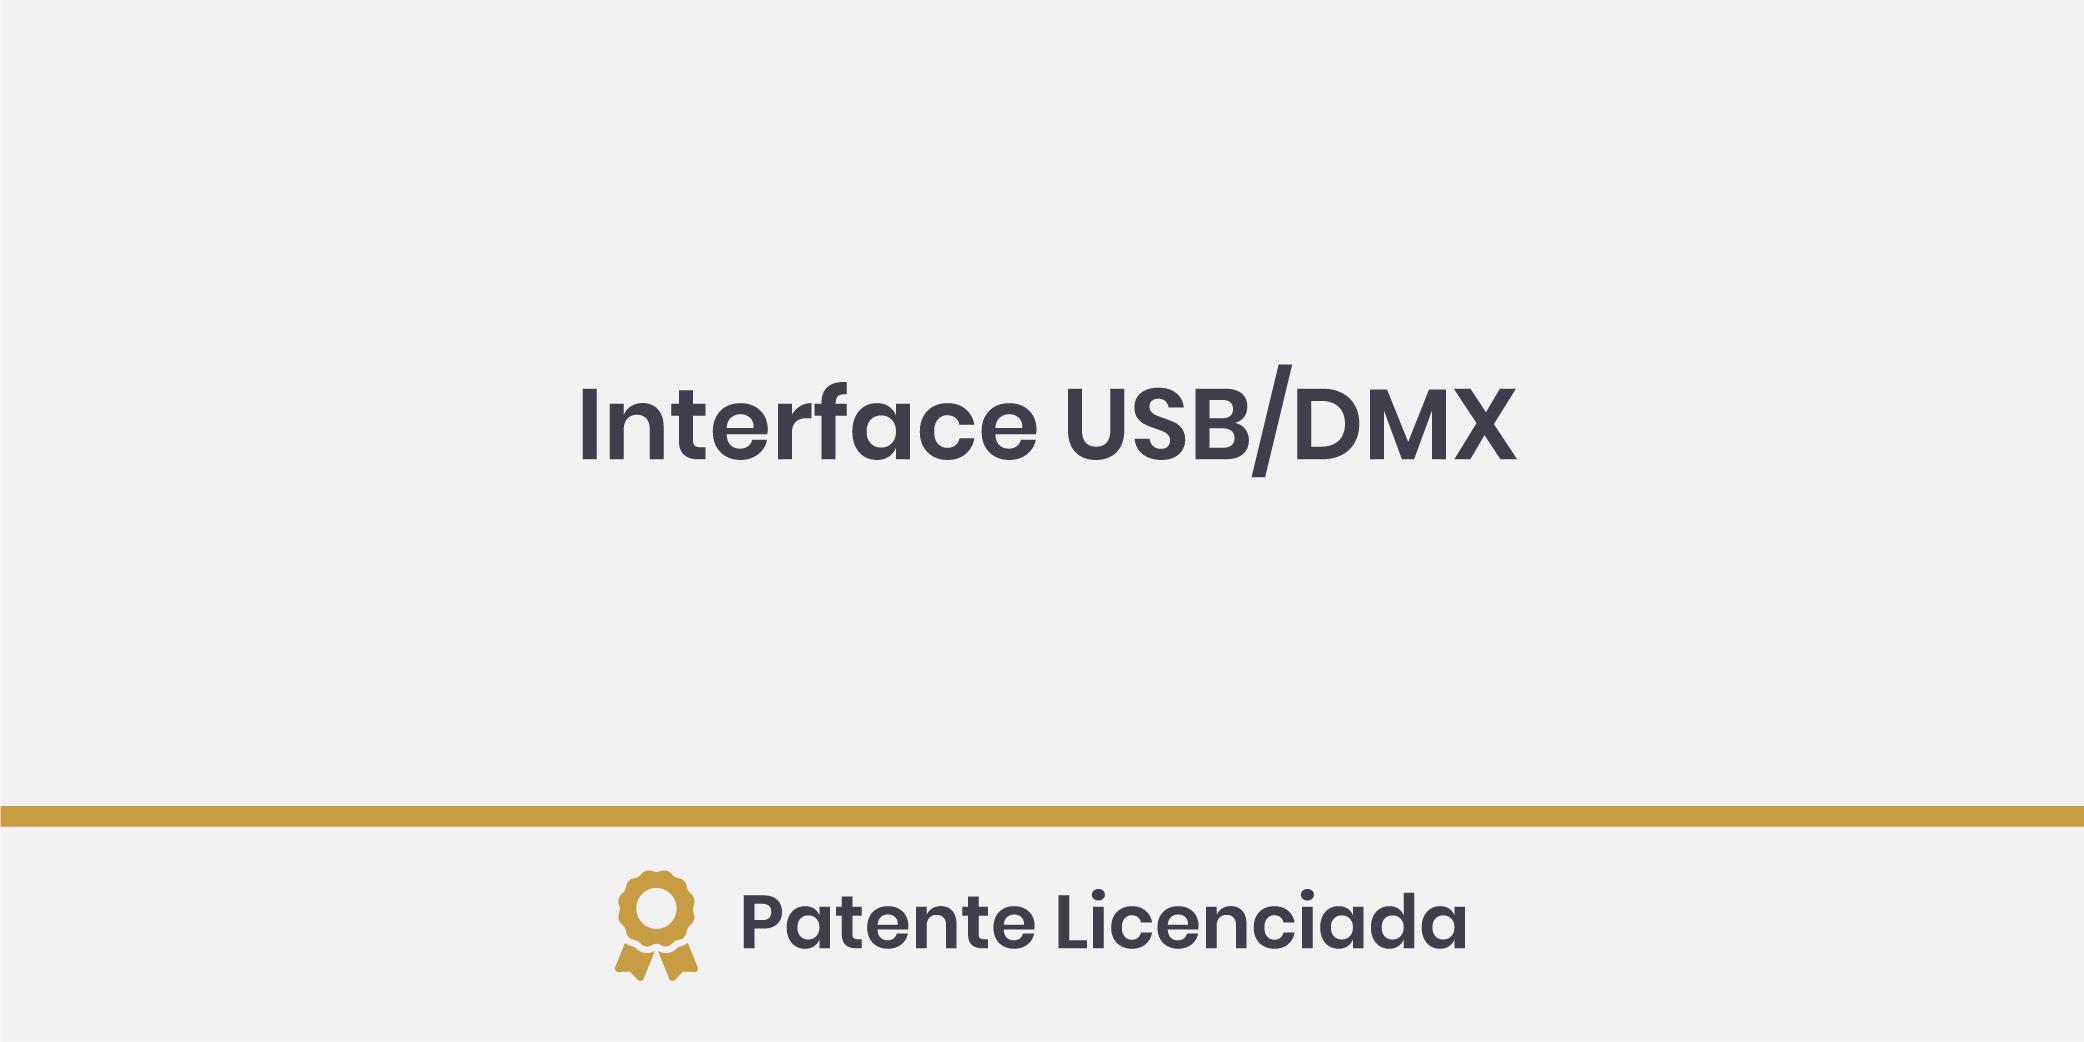 Interface USB/DMX; Patente Licenciada.